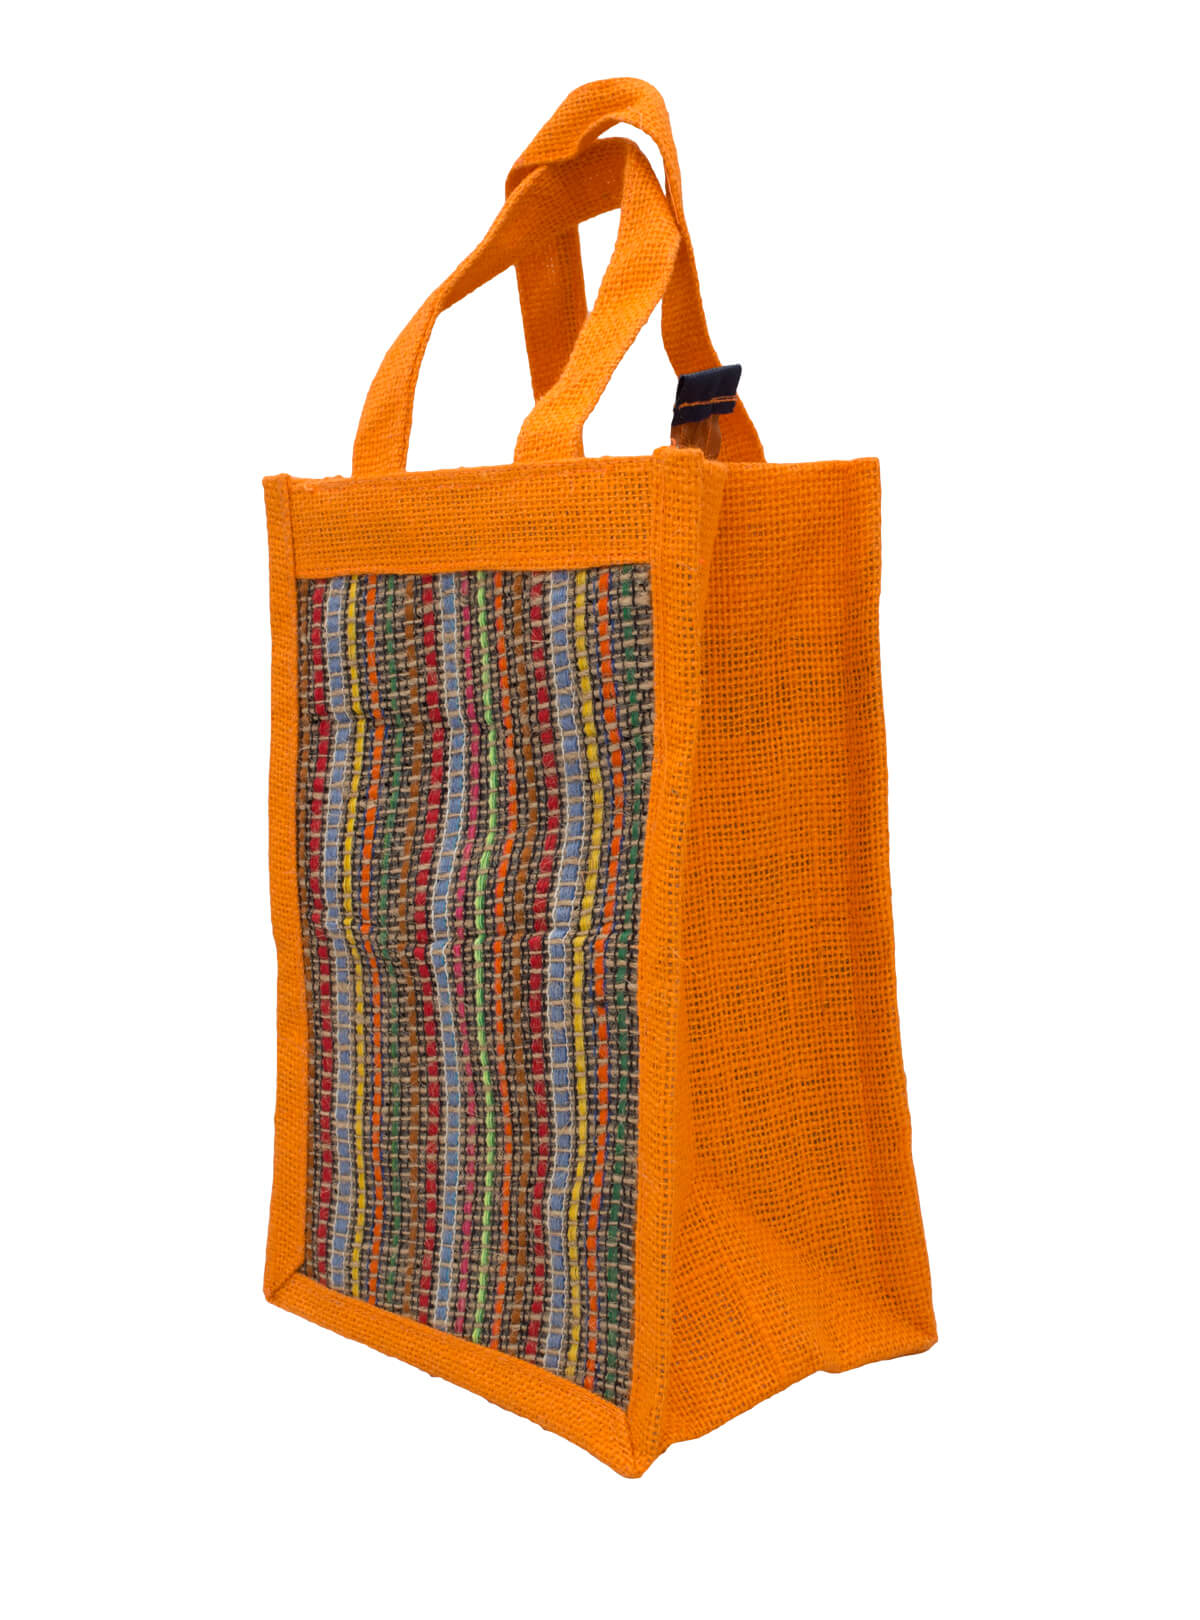 Eco-Friendly Heritage Green Natural Jute Plane Woven Handmade Reusable Lunch Bag